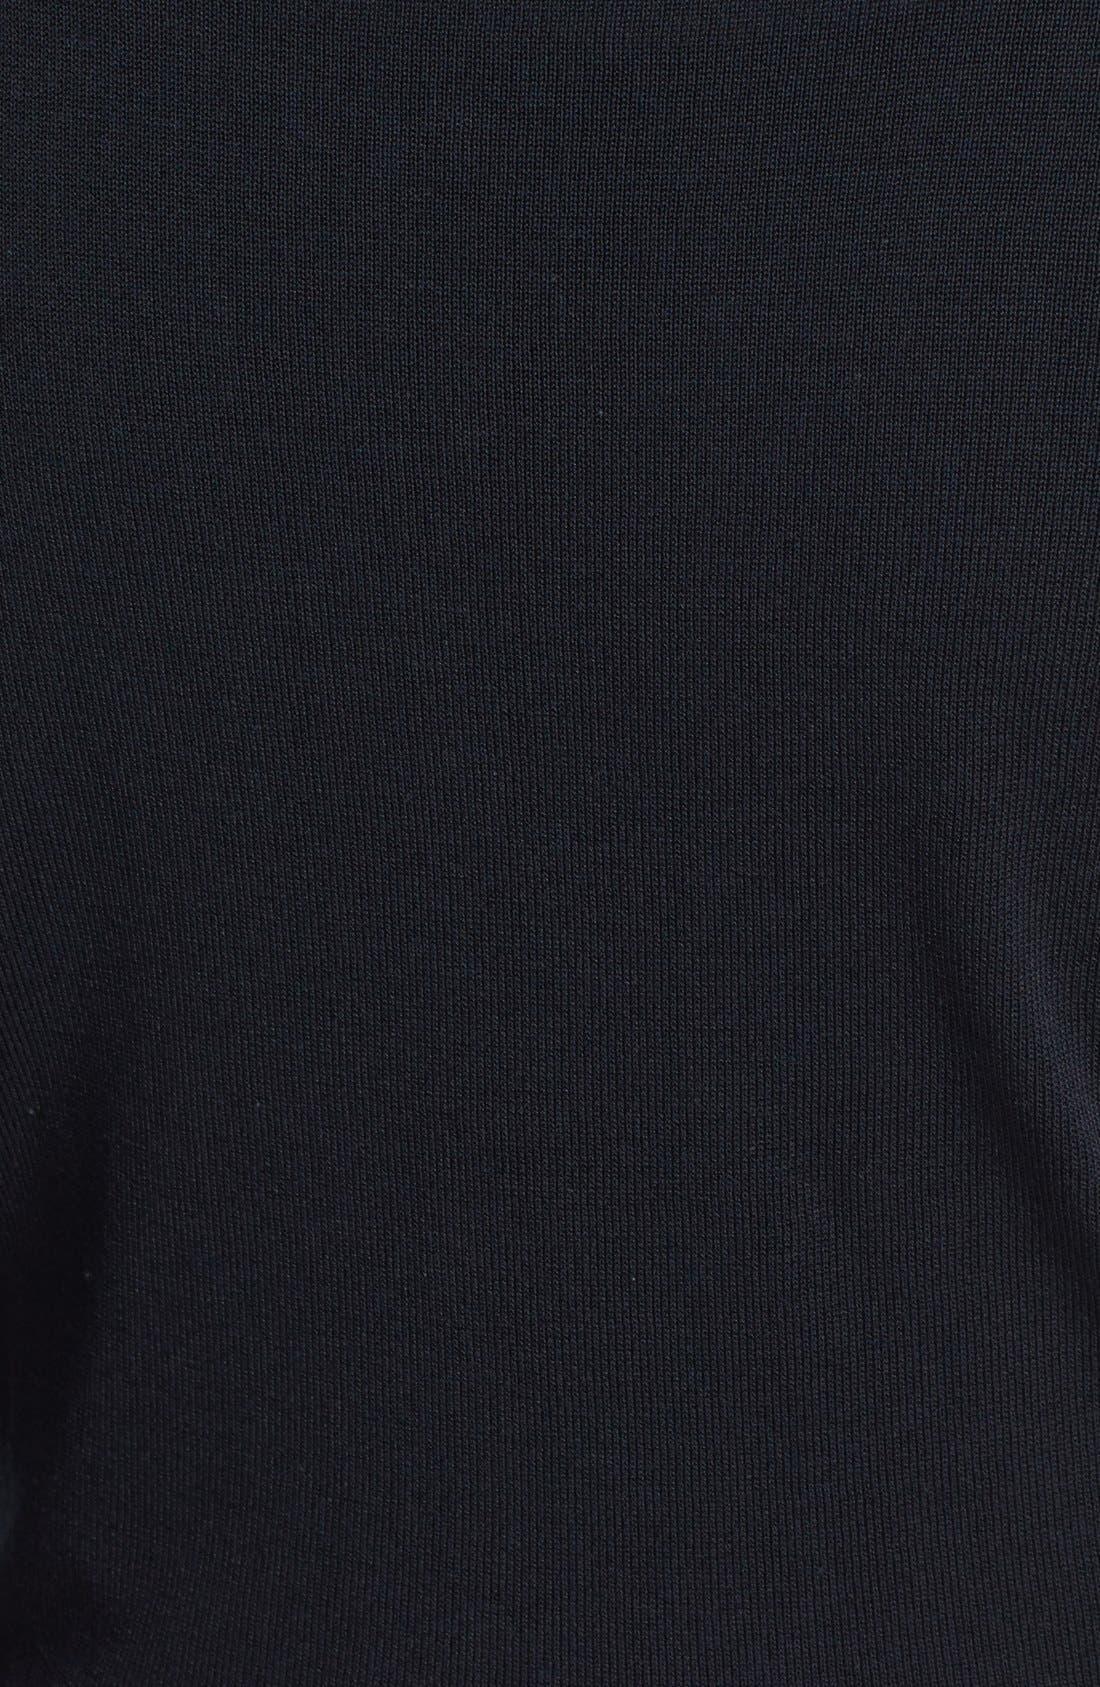 Alternate Image 3  - BOSS Contrast Stripe Knit Cardigan